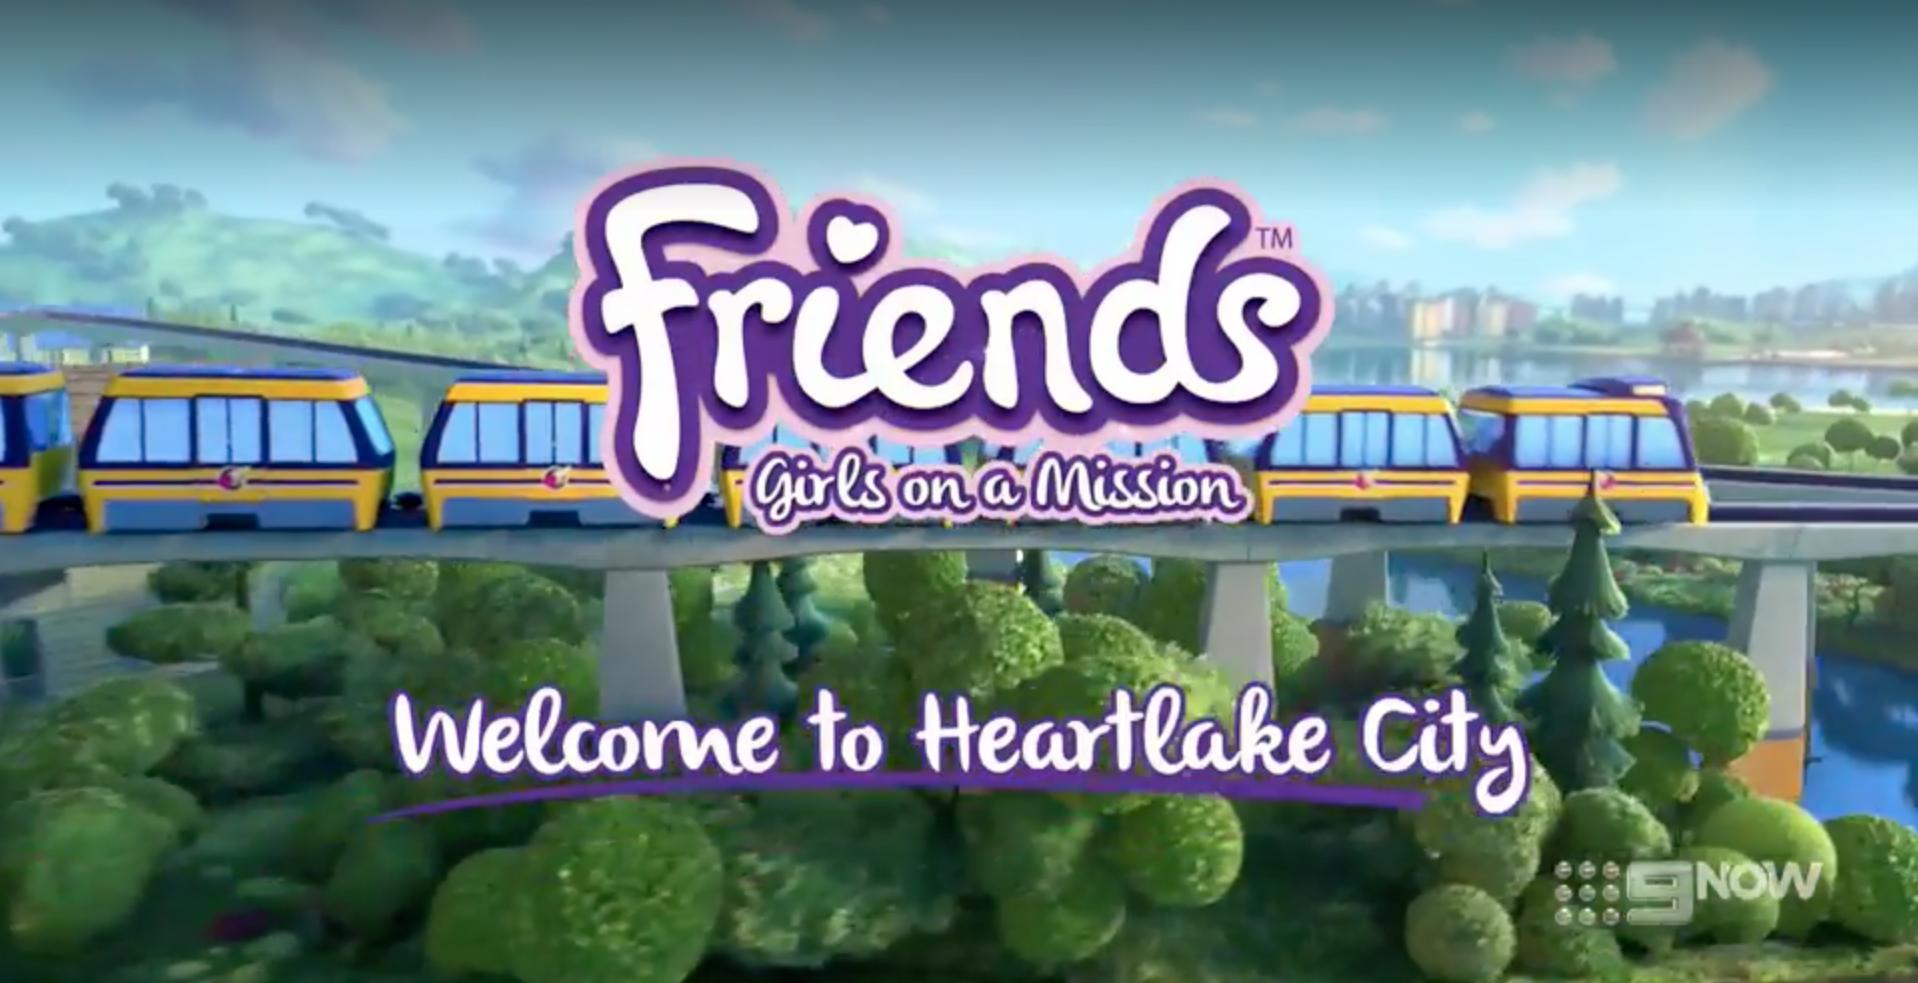 Welcome To Heartlake City Lego Friends Wiki Fandom Powered By Wikia